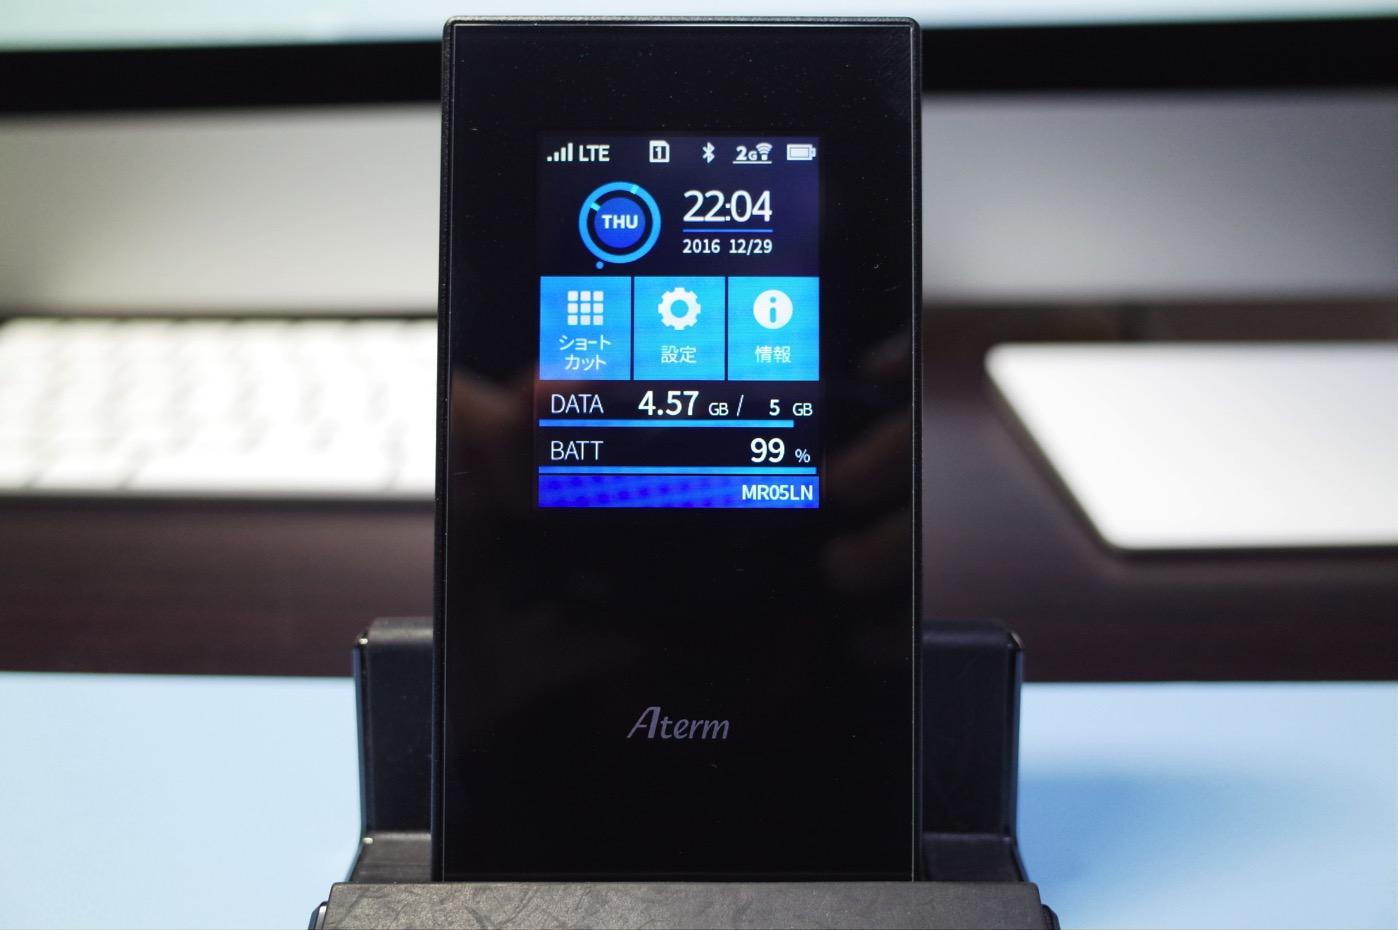 NEC Aterm 保護ガラス-6